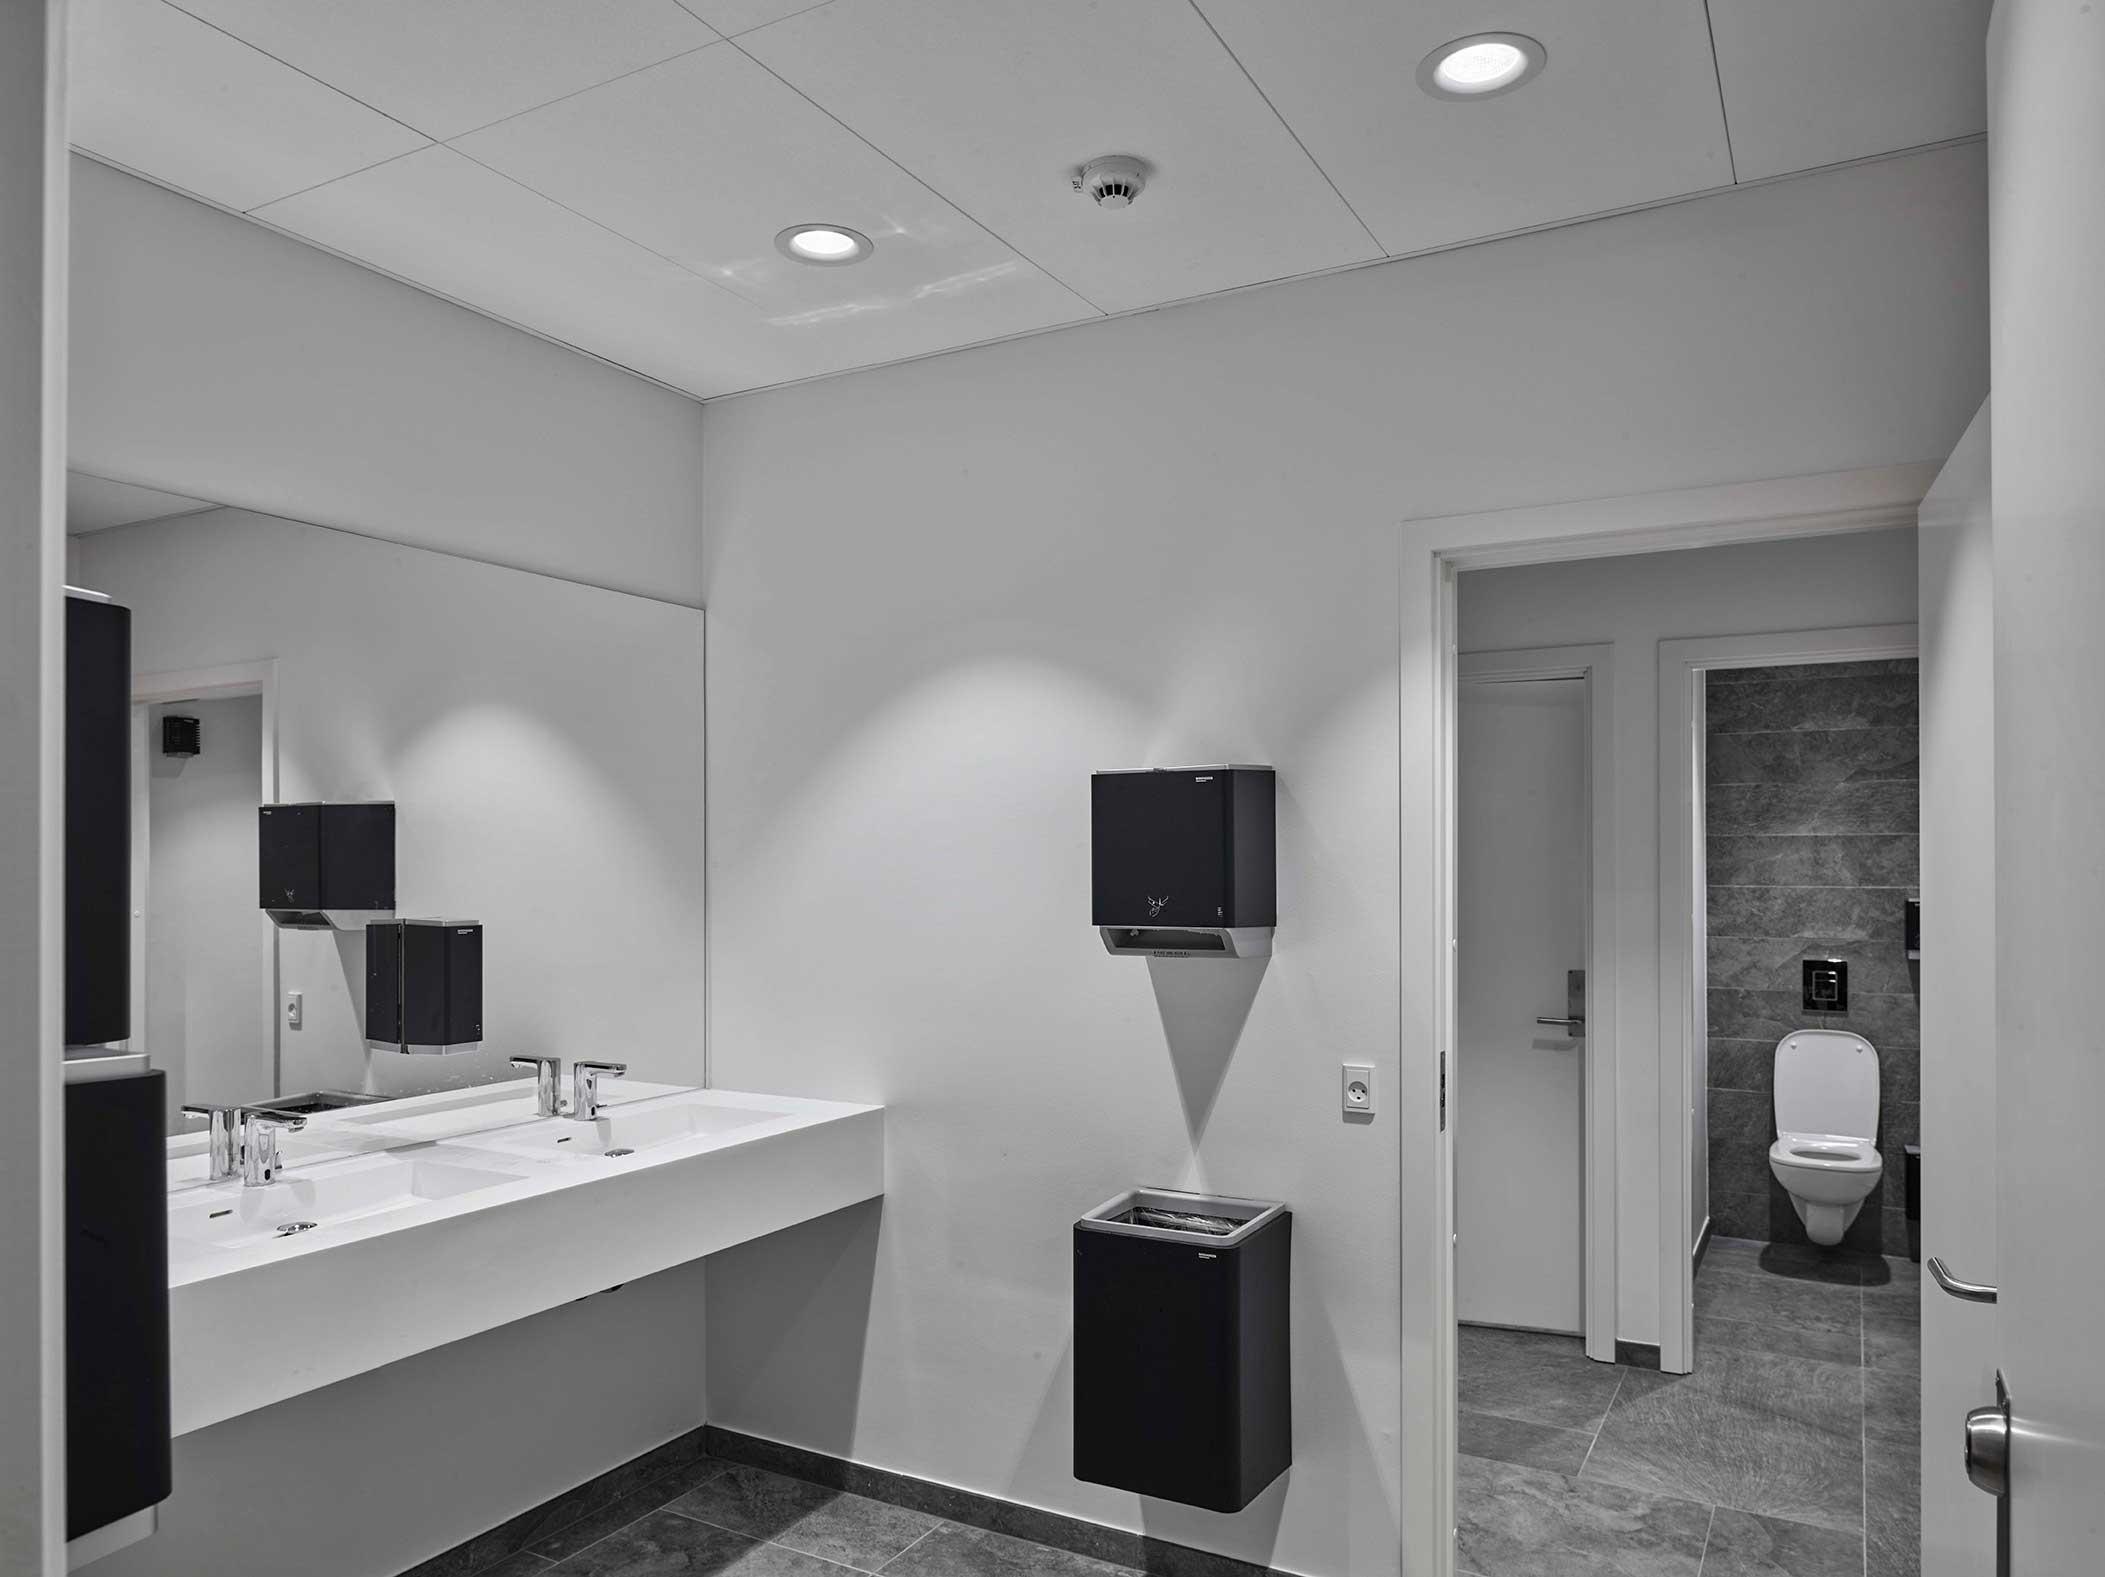 Hotel Alsik i Sønderborg Indbygget i loft Linia DS-F 150 på toiletterne